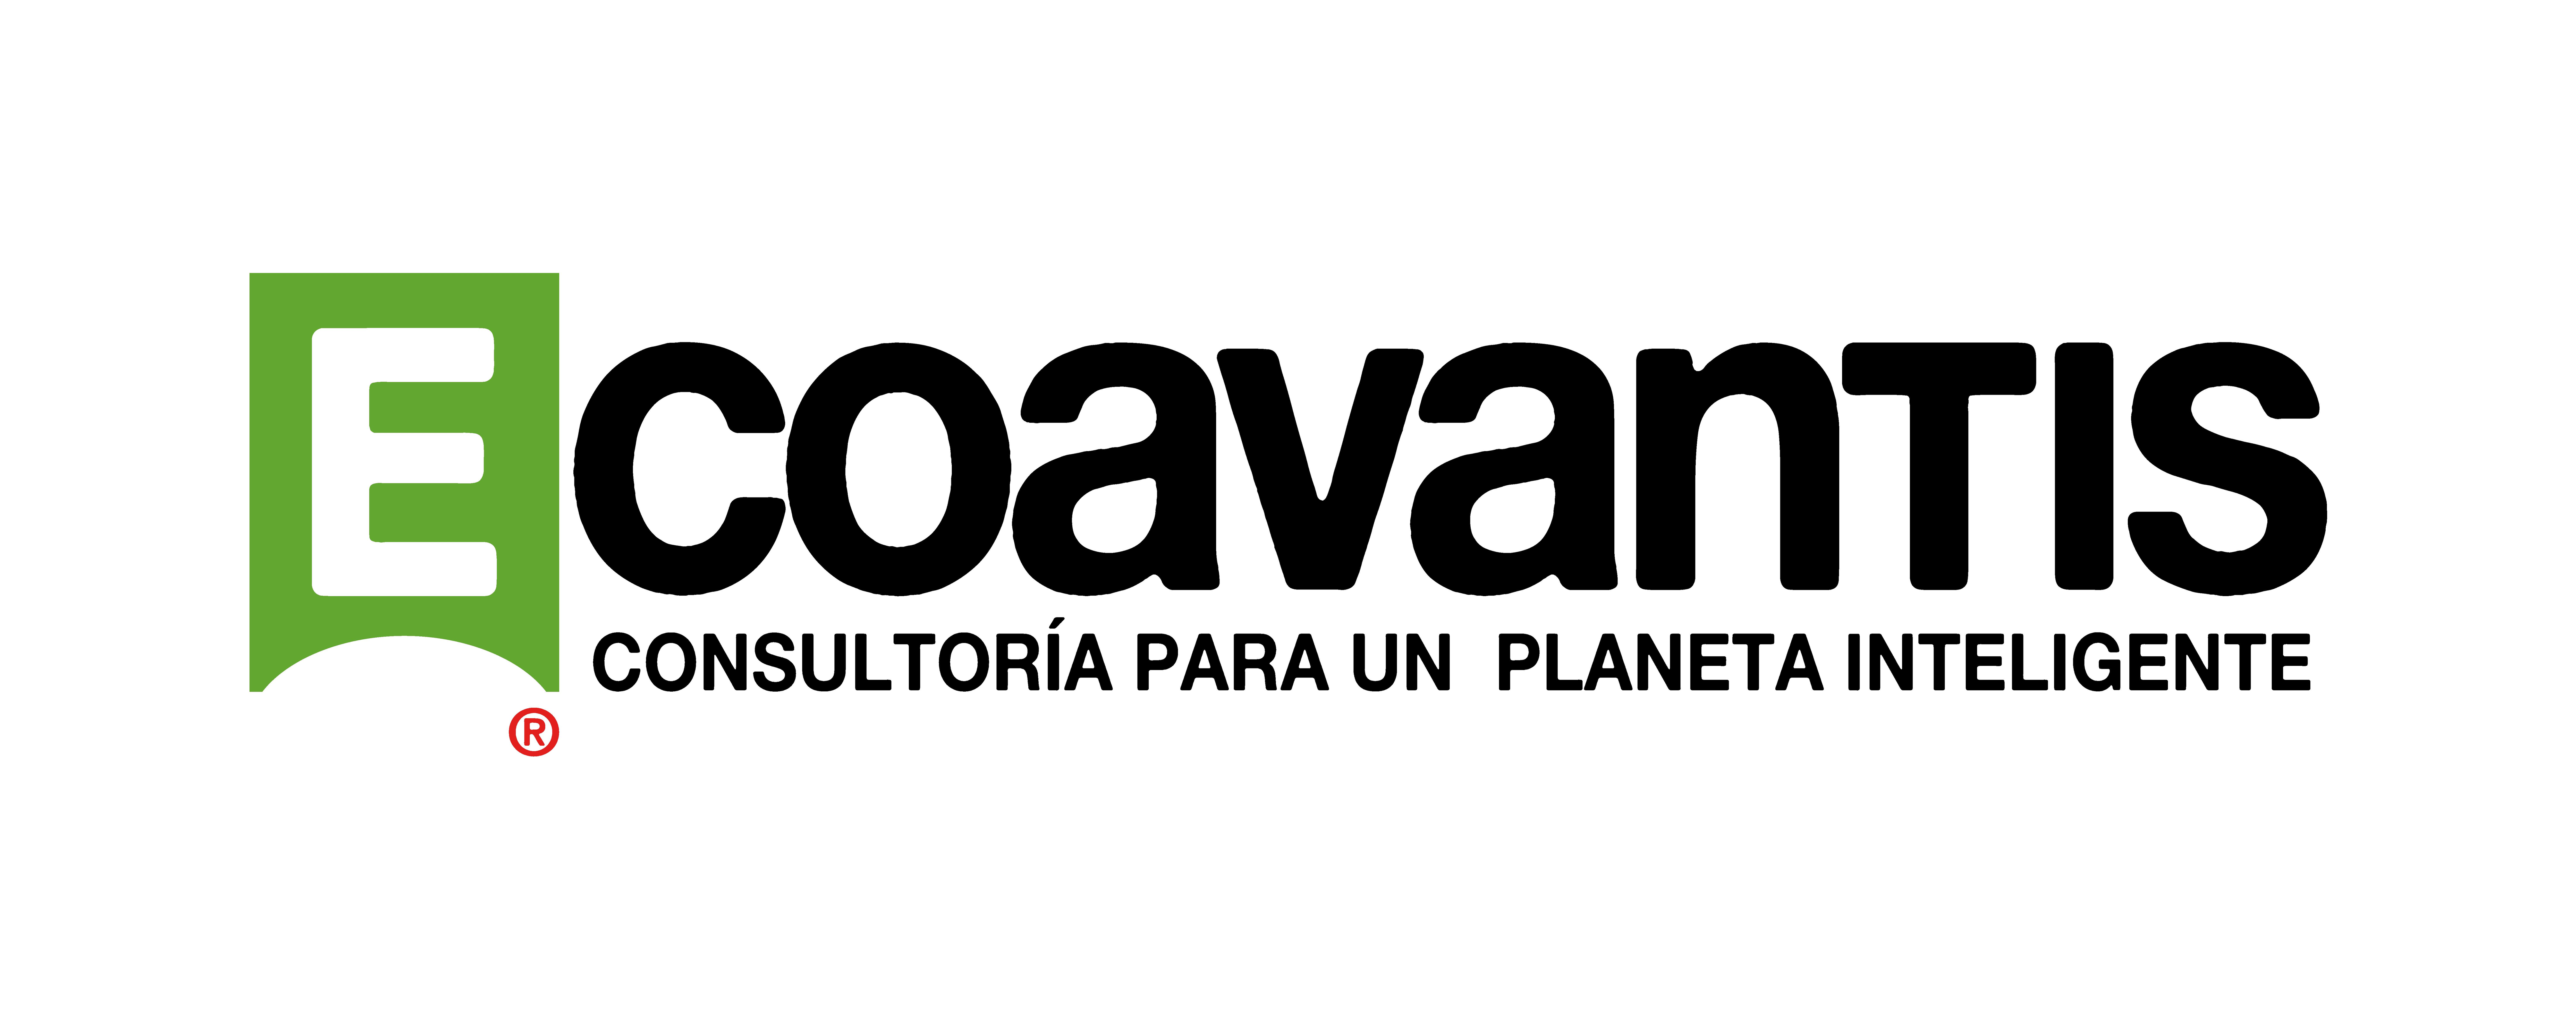 Aciclovir Comprar Online